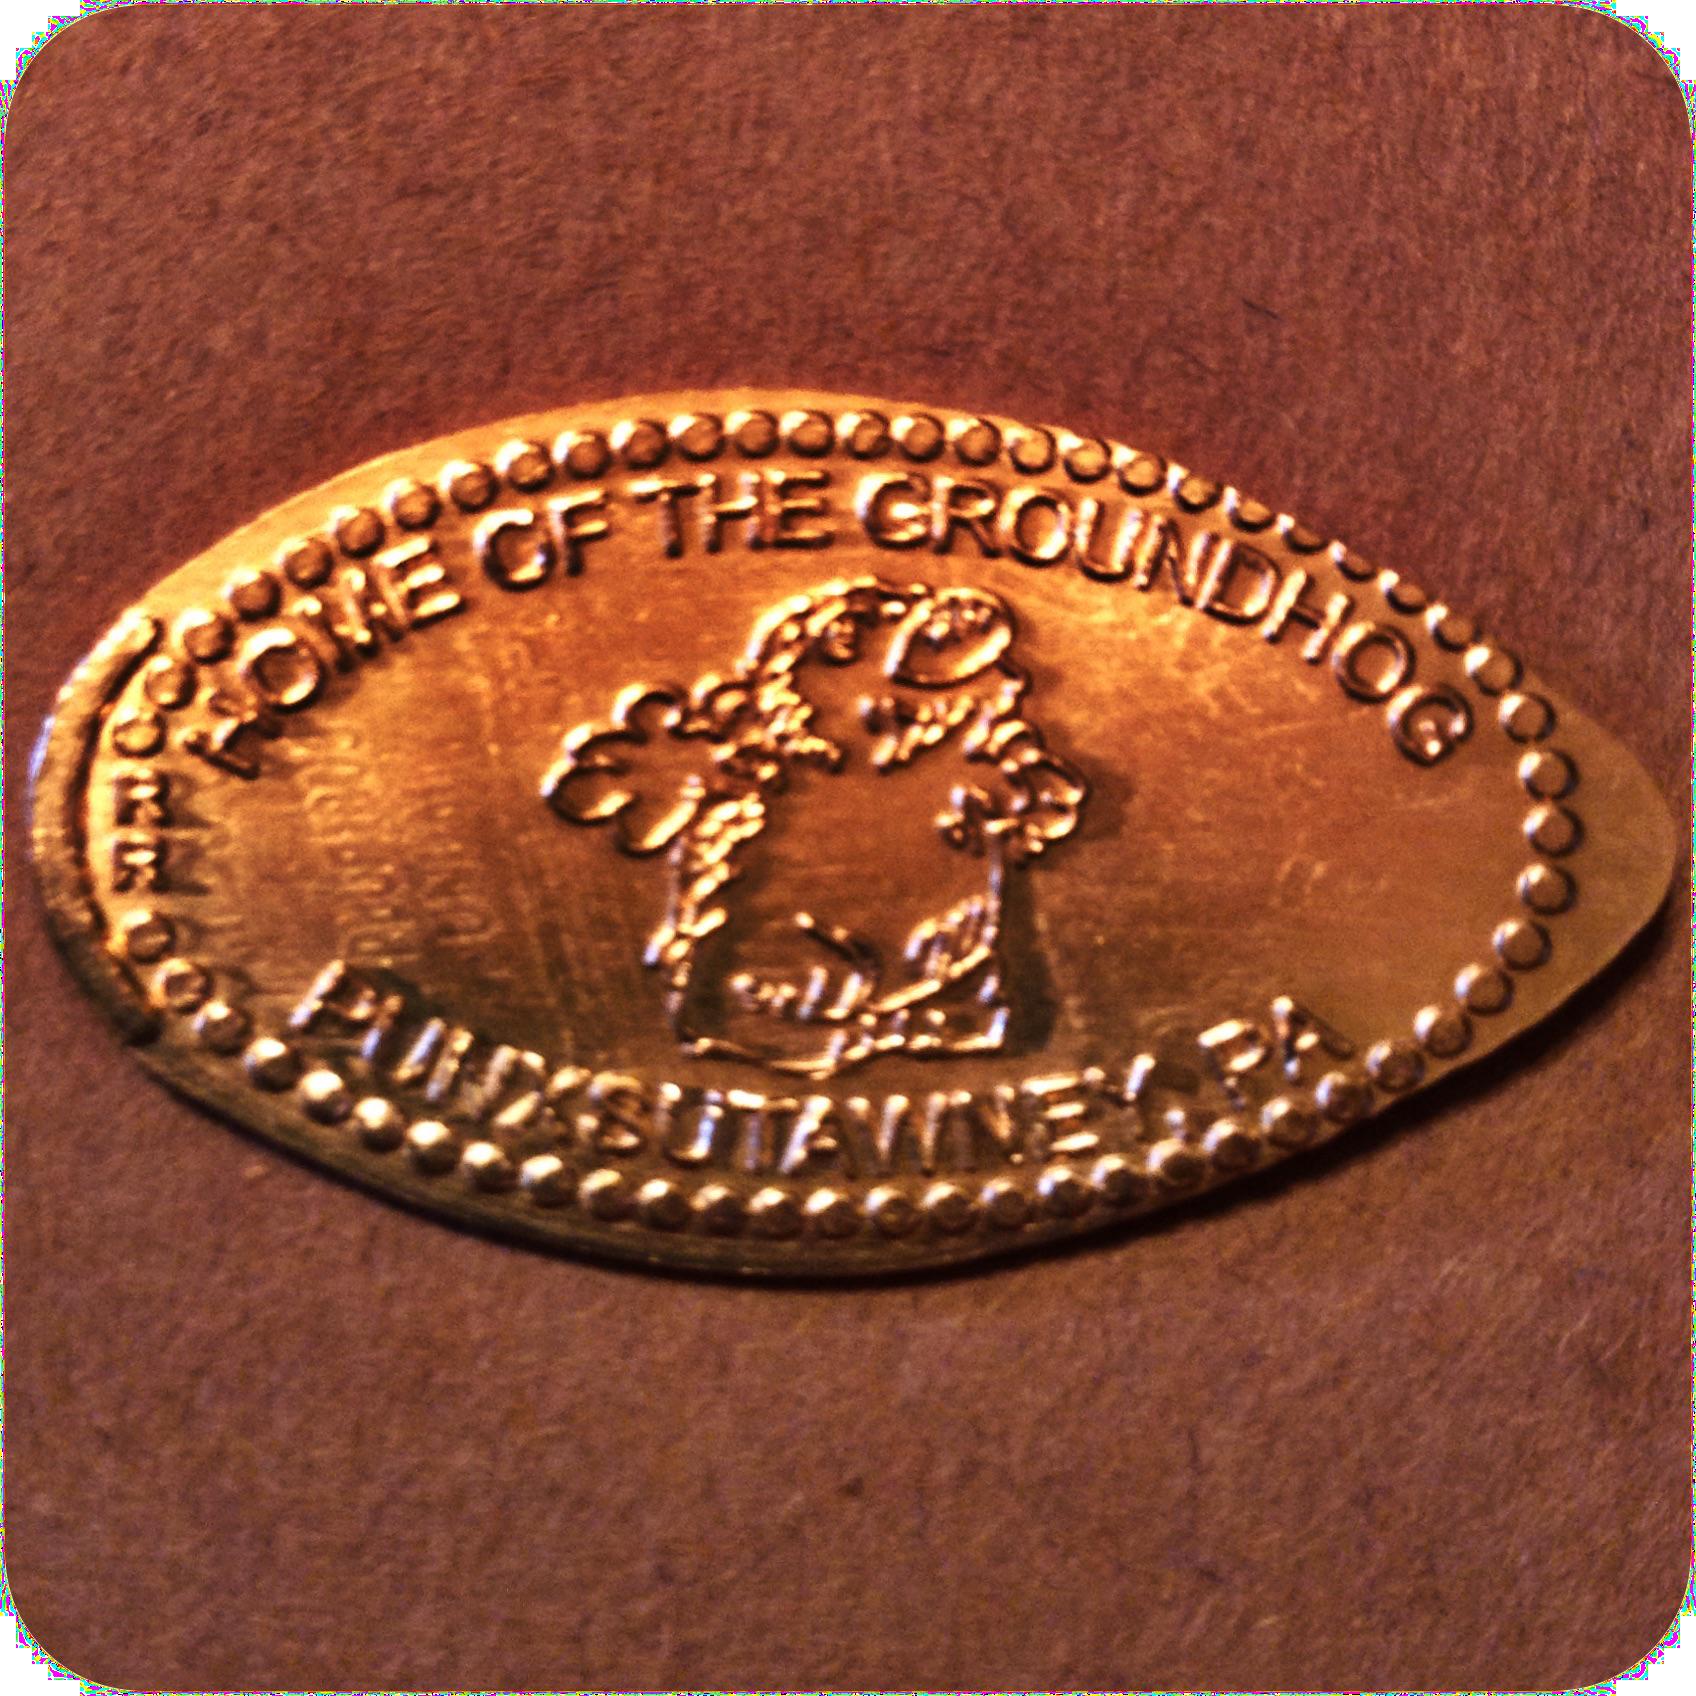 Home of the Groundhog - Punxsutawney Phil's Official Souvenir Shop, Pennsylvania